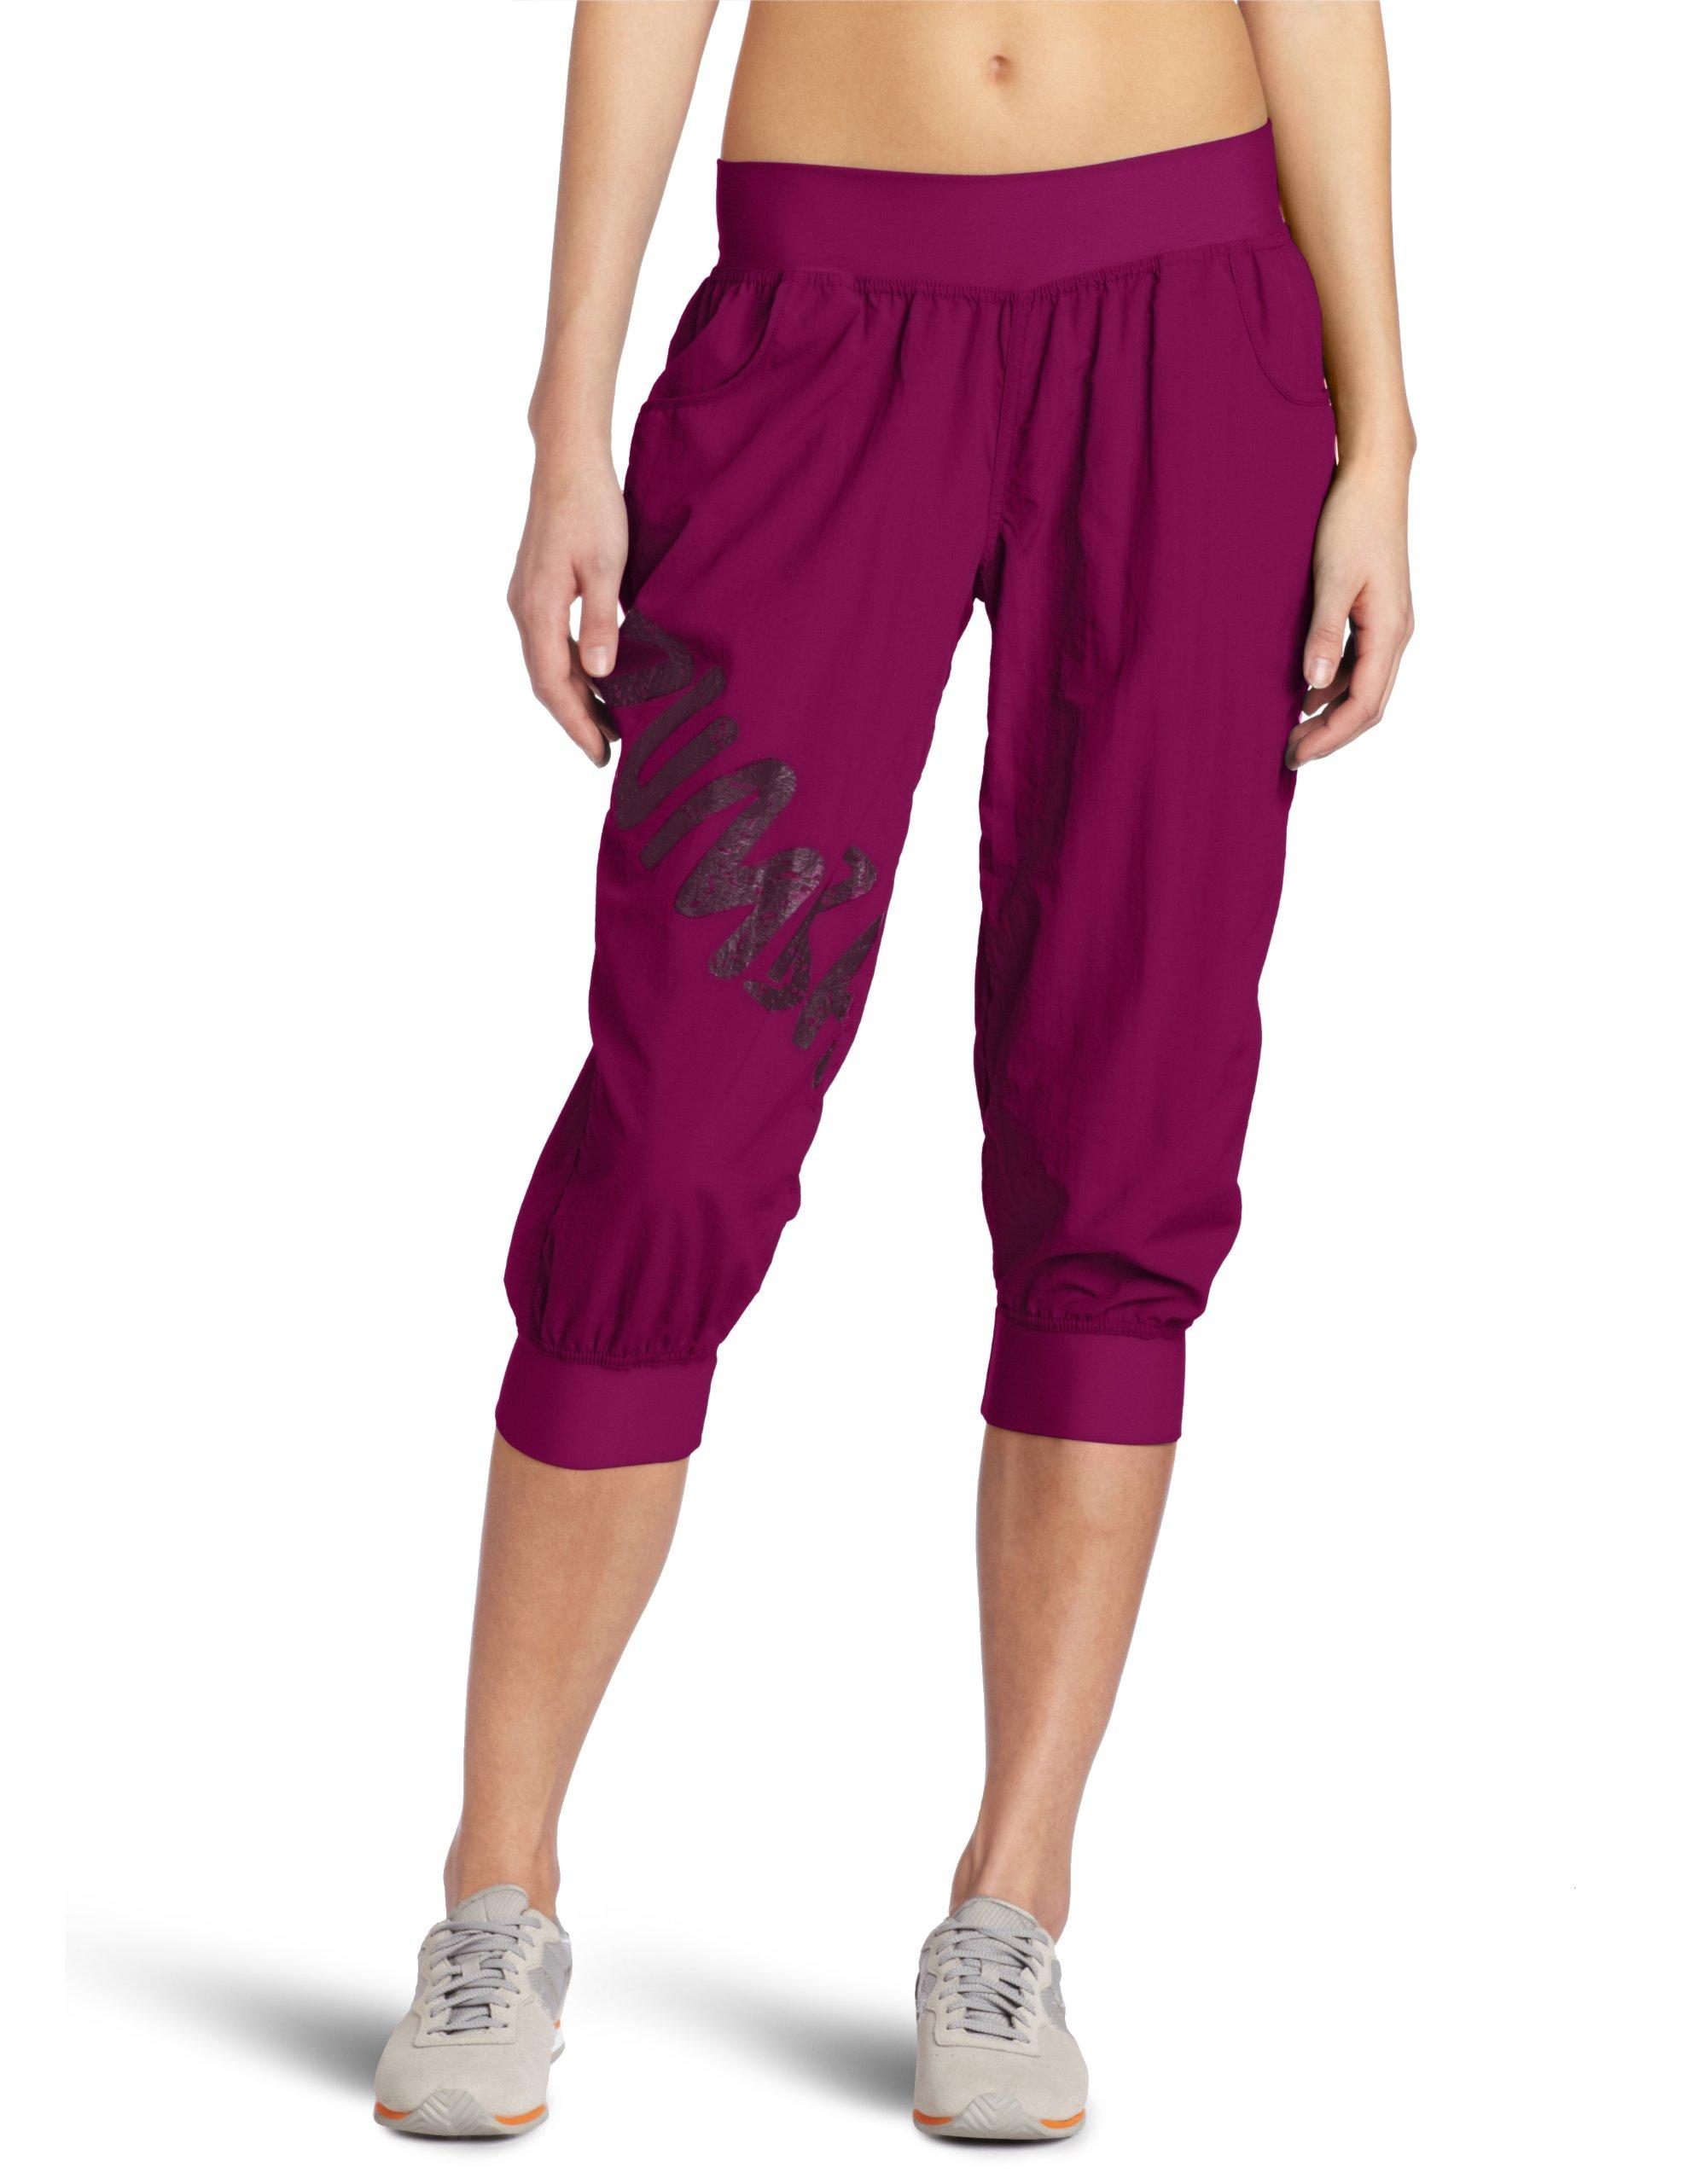 Zumba Fitness LLC Women's Feelin It Cargo Capri, Plum, XX-Large by Zumba